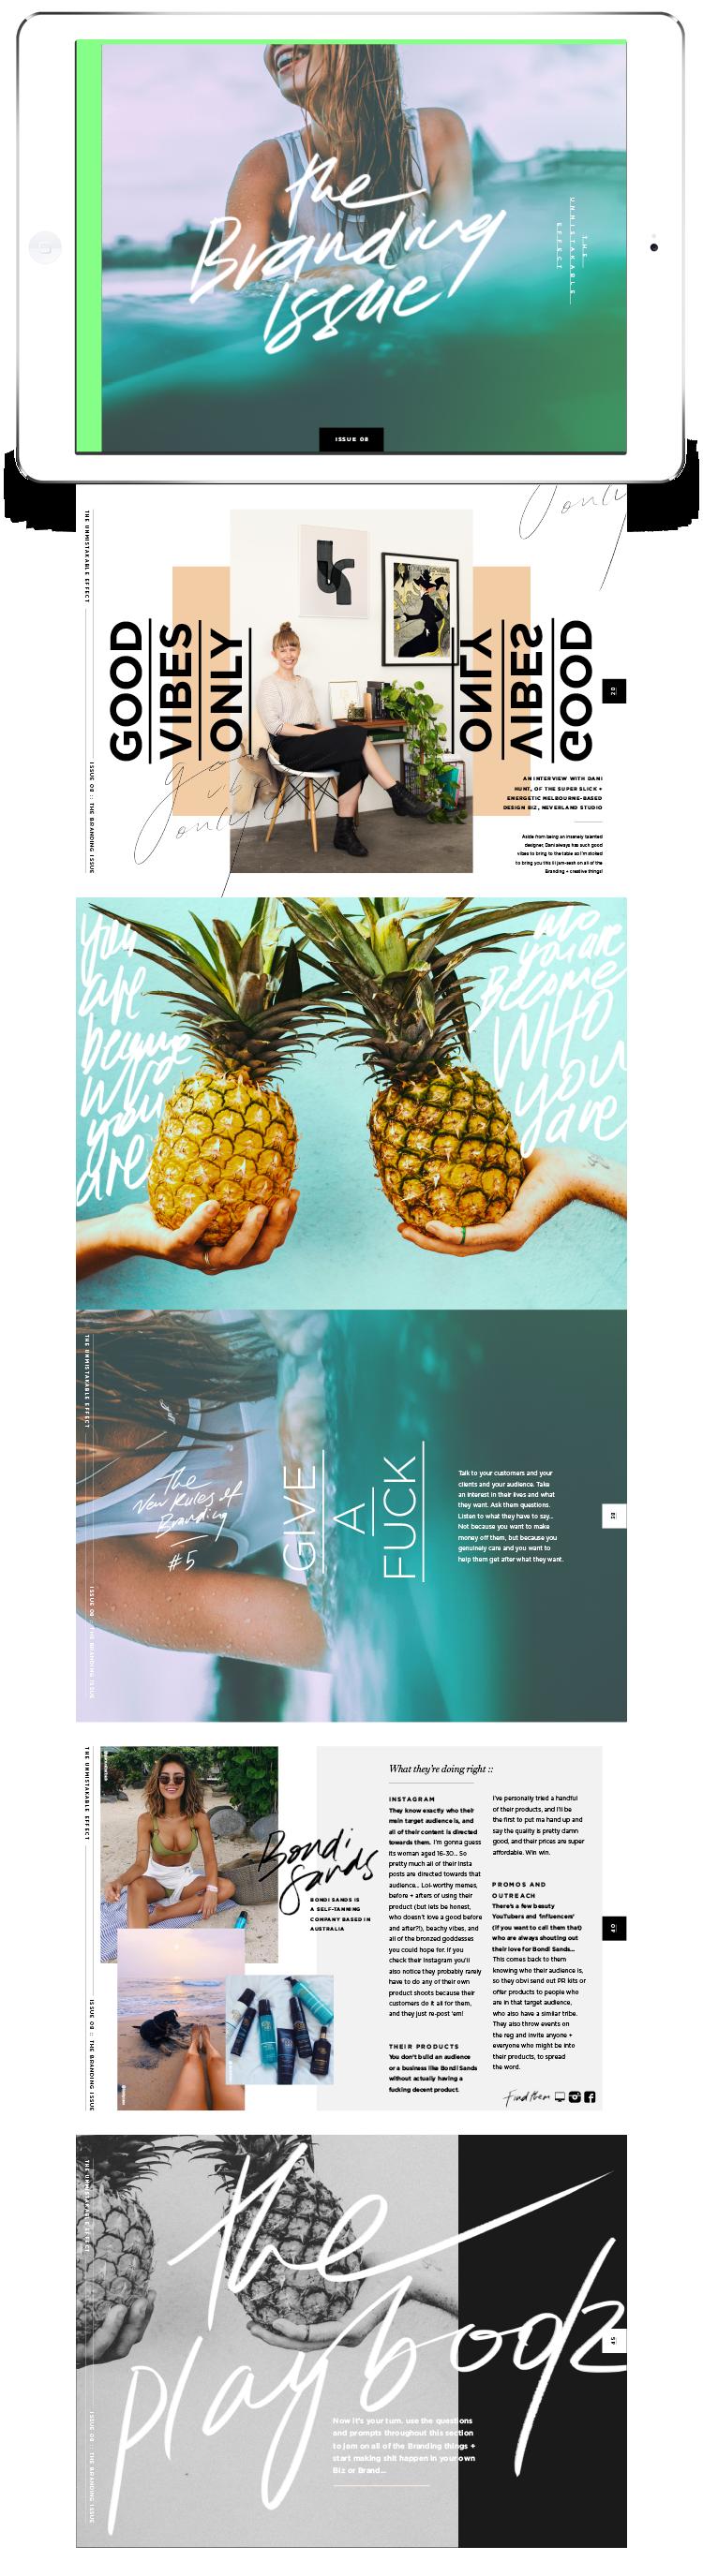 The Unmistakable Effect | Digital + Print Magazine | sianrichardson.co